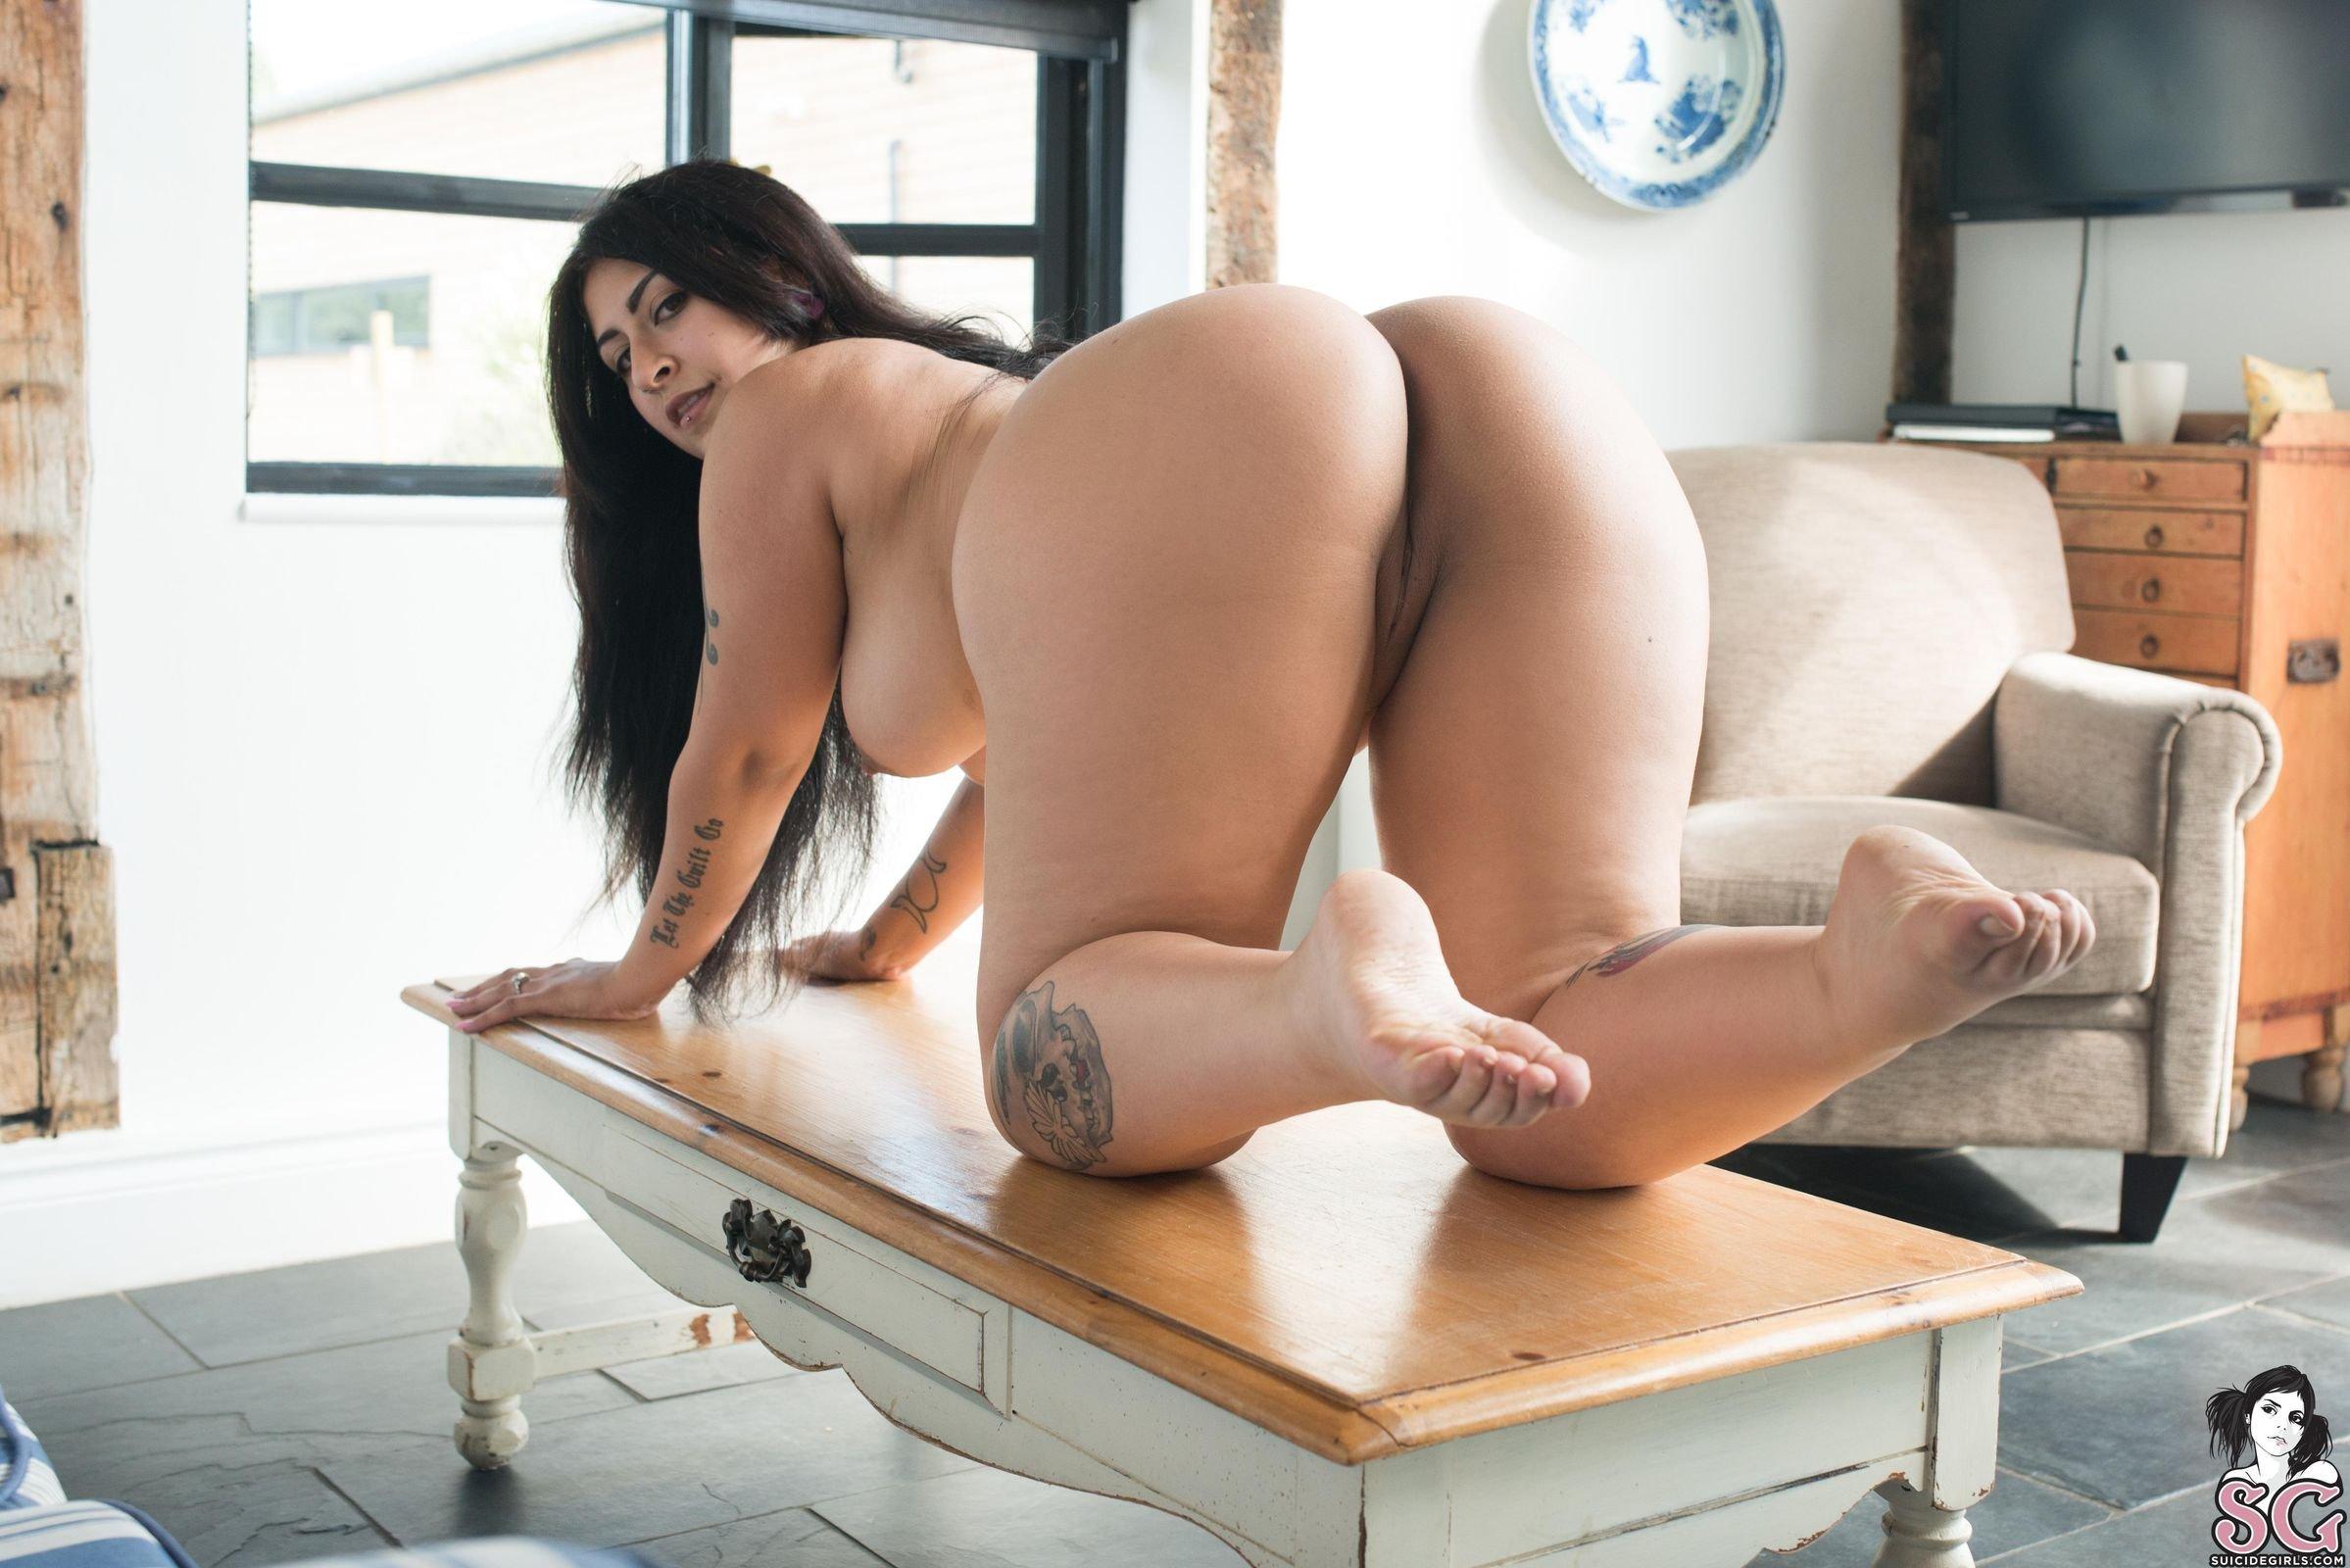 Curvy but not fat nude women